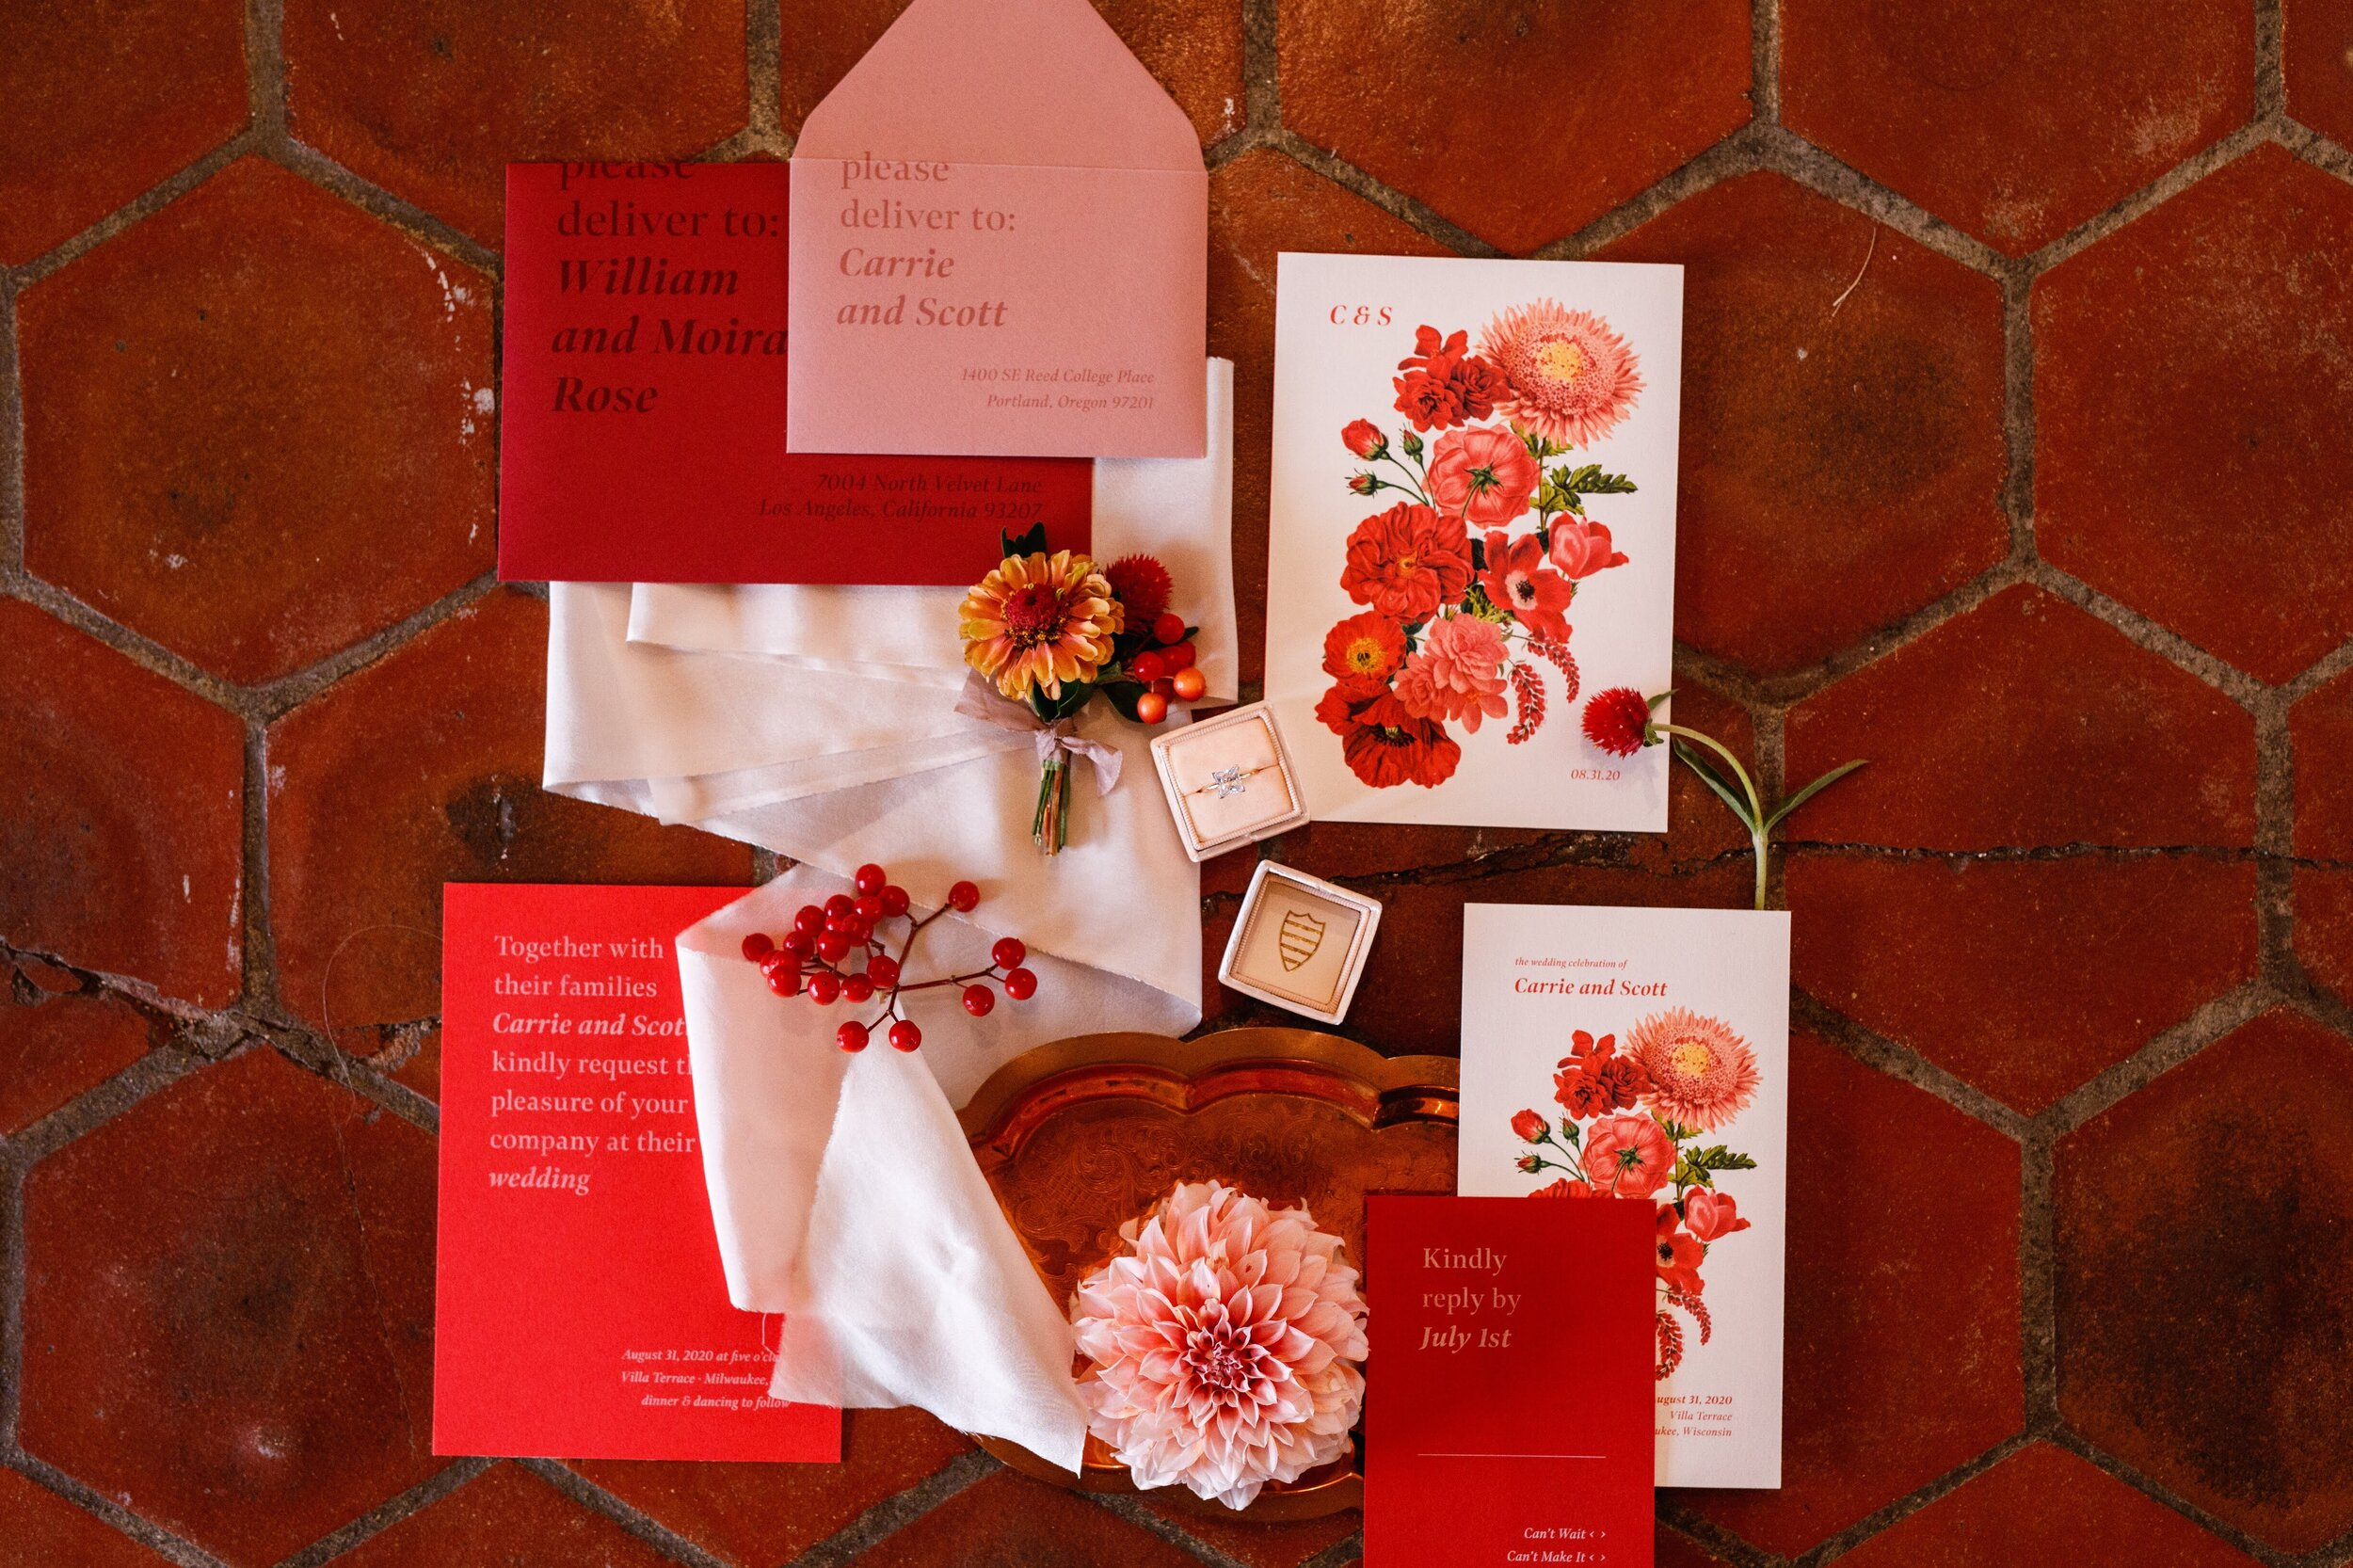 Villa-Terrace-Hall-Creative-CoCustom-Wedding-Invitations.jpg